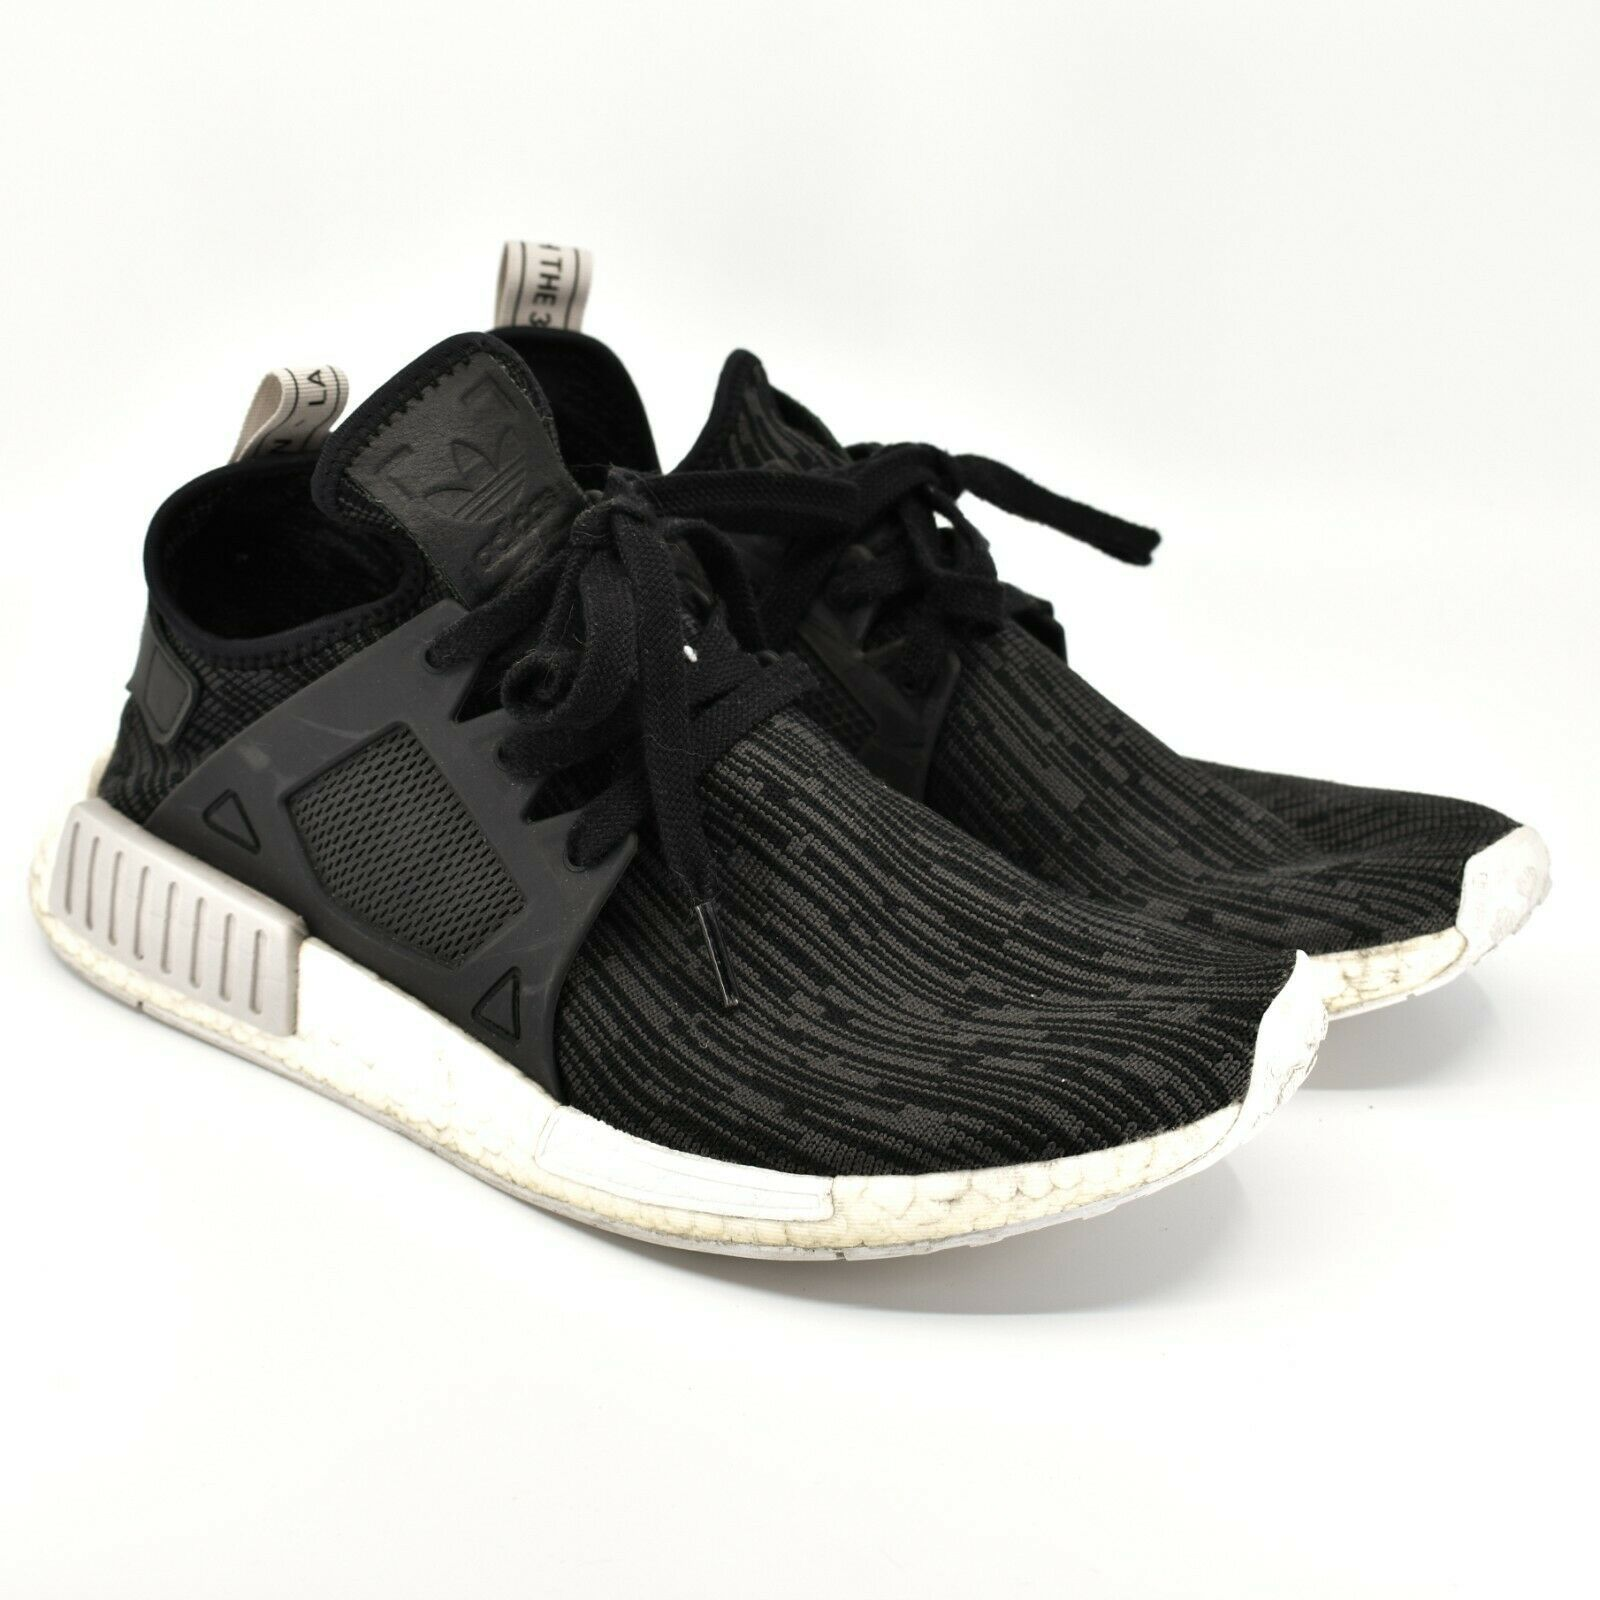 adidas Women's adidas NMD XR1 PK Primeknit Utility Black Gltich Shoes Size 10